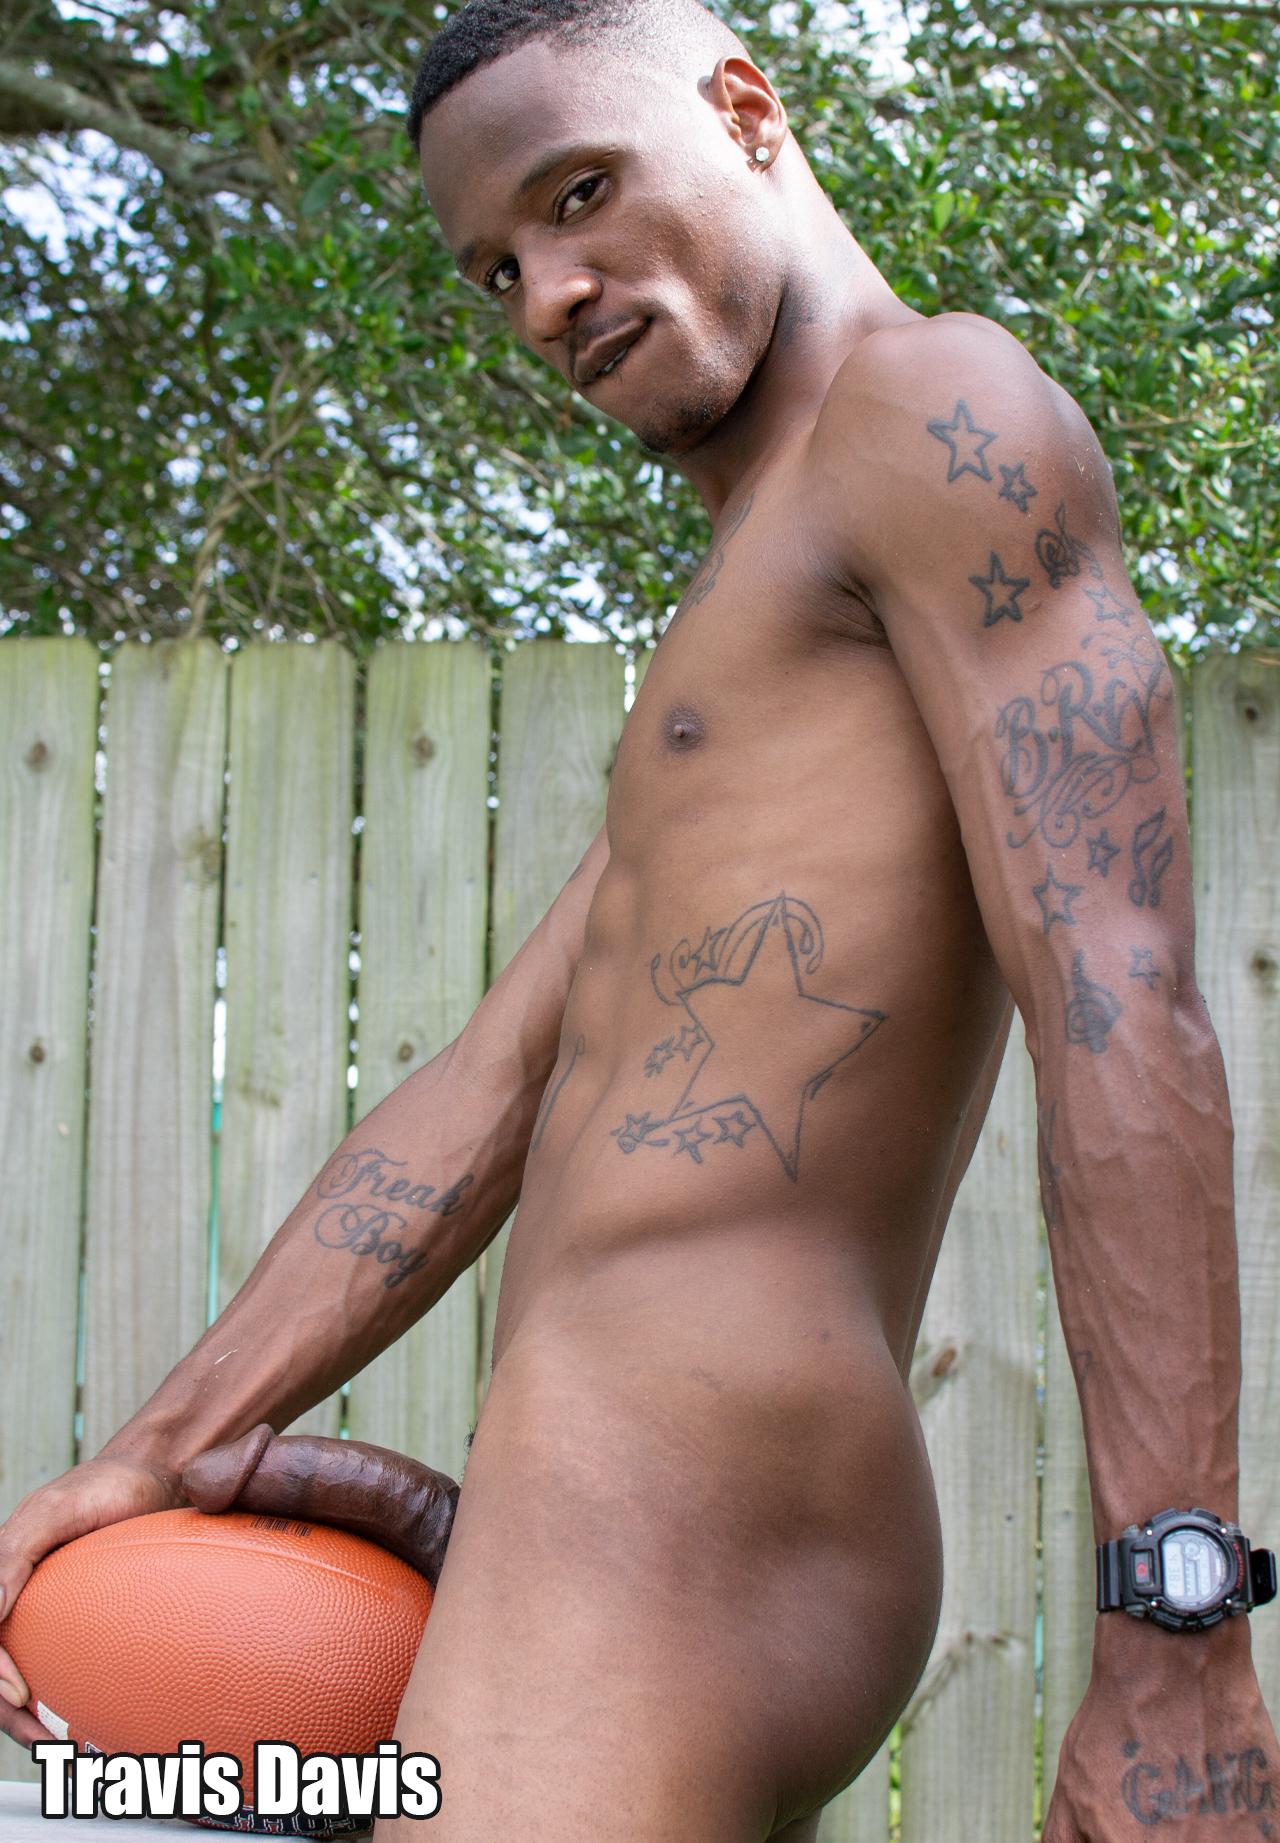 Travis Davis